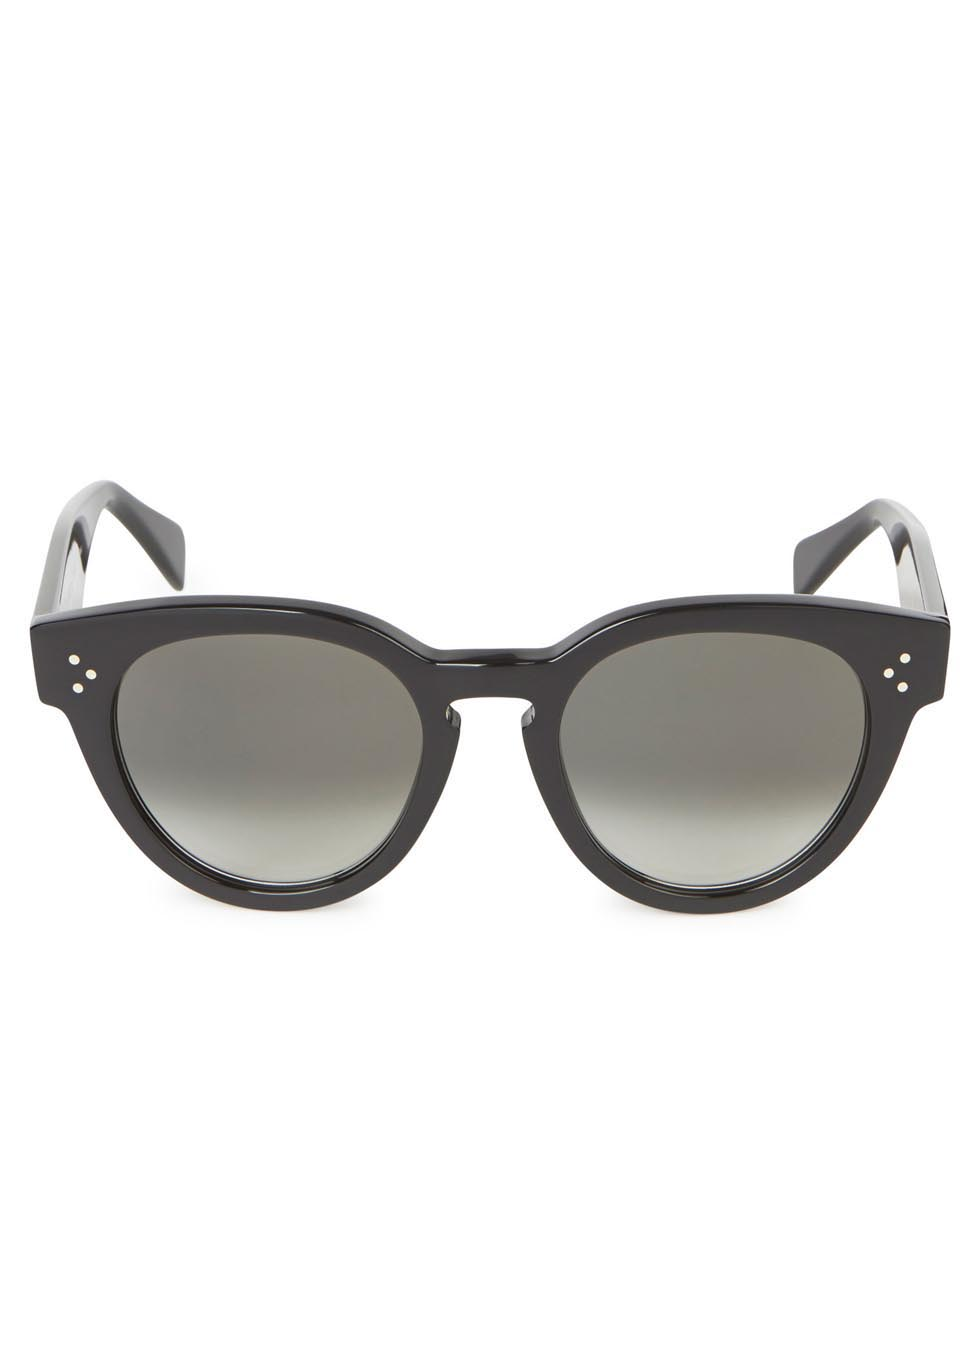 Black round-frame sunglasses - Celine